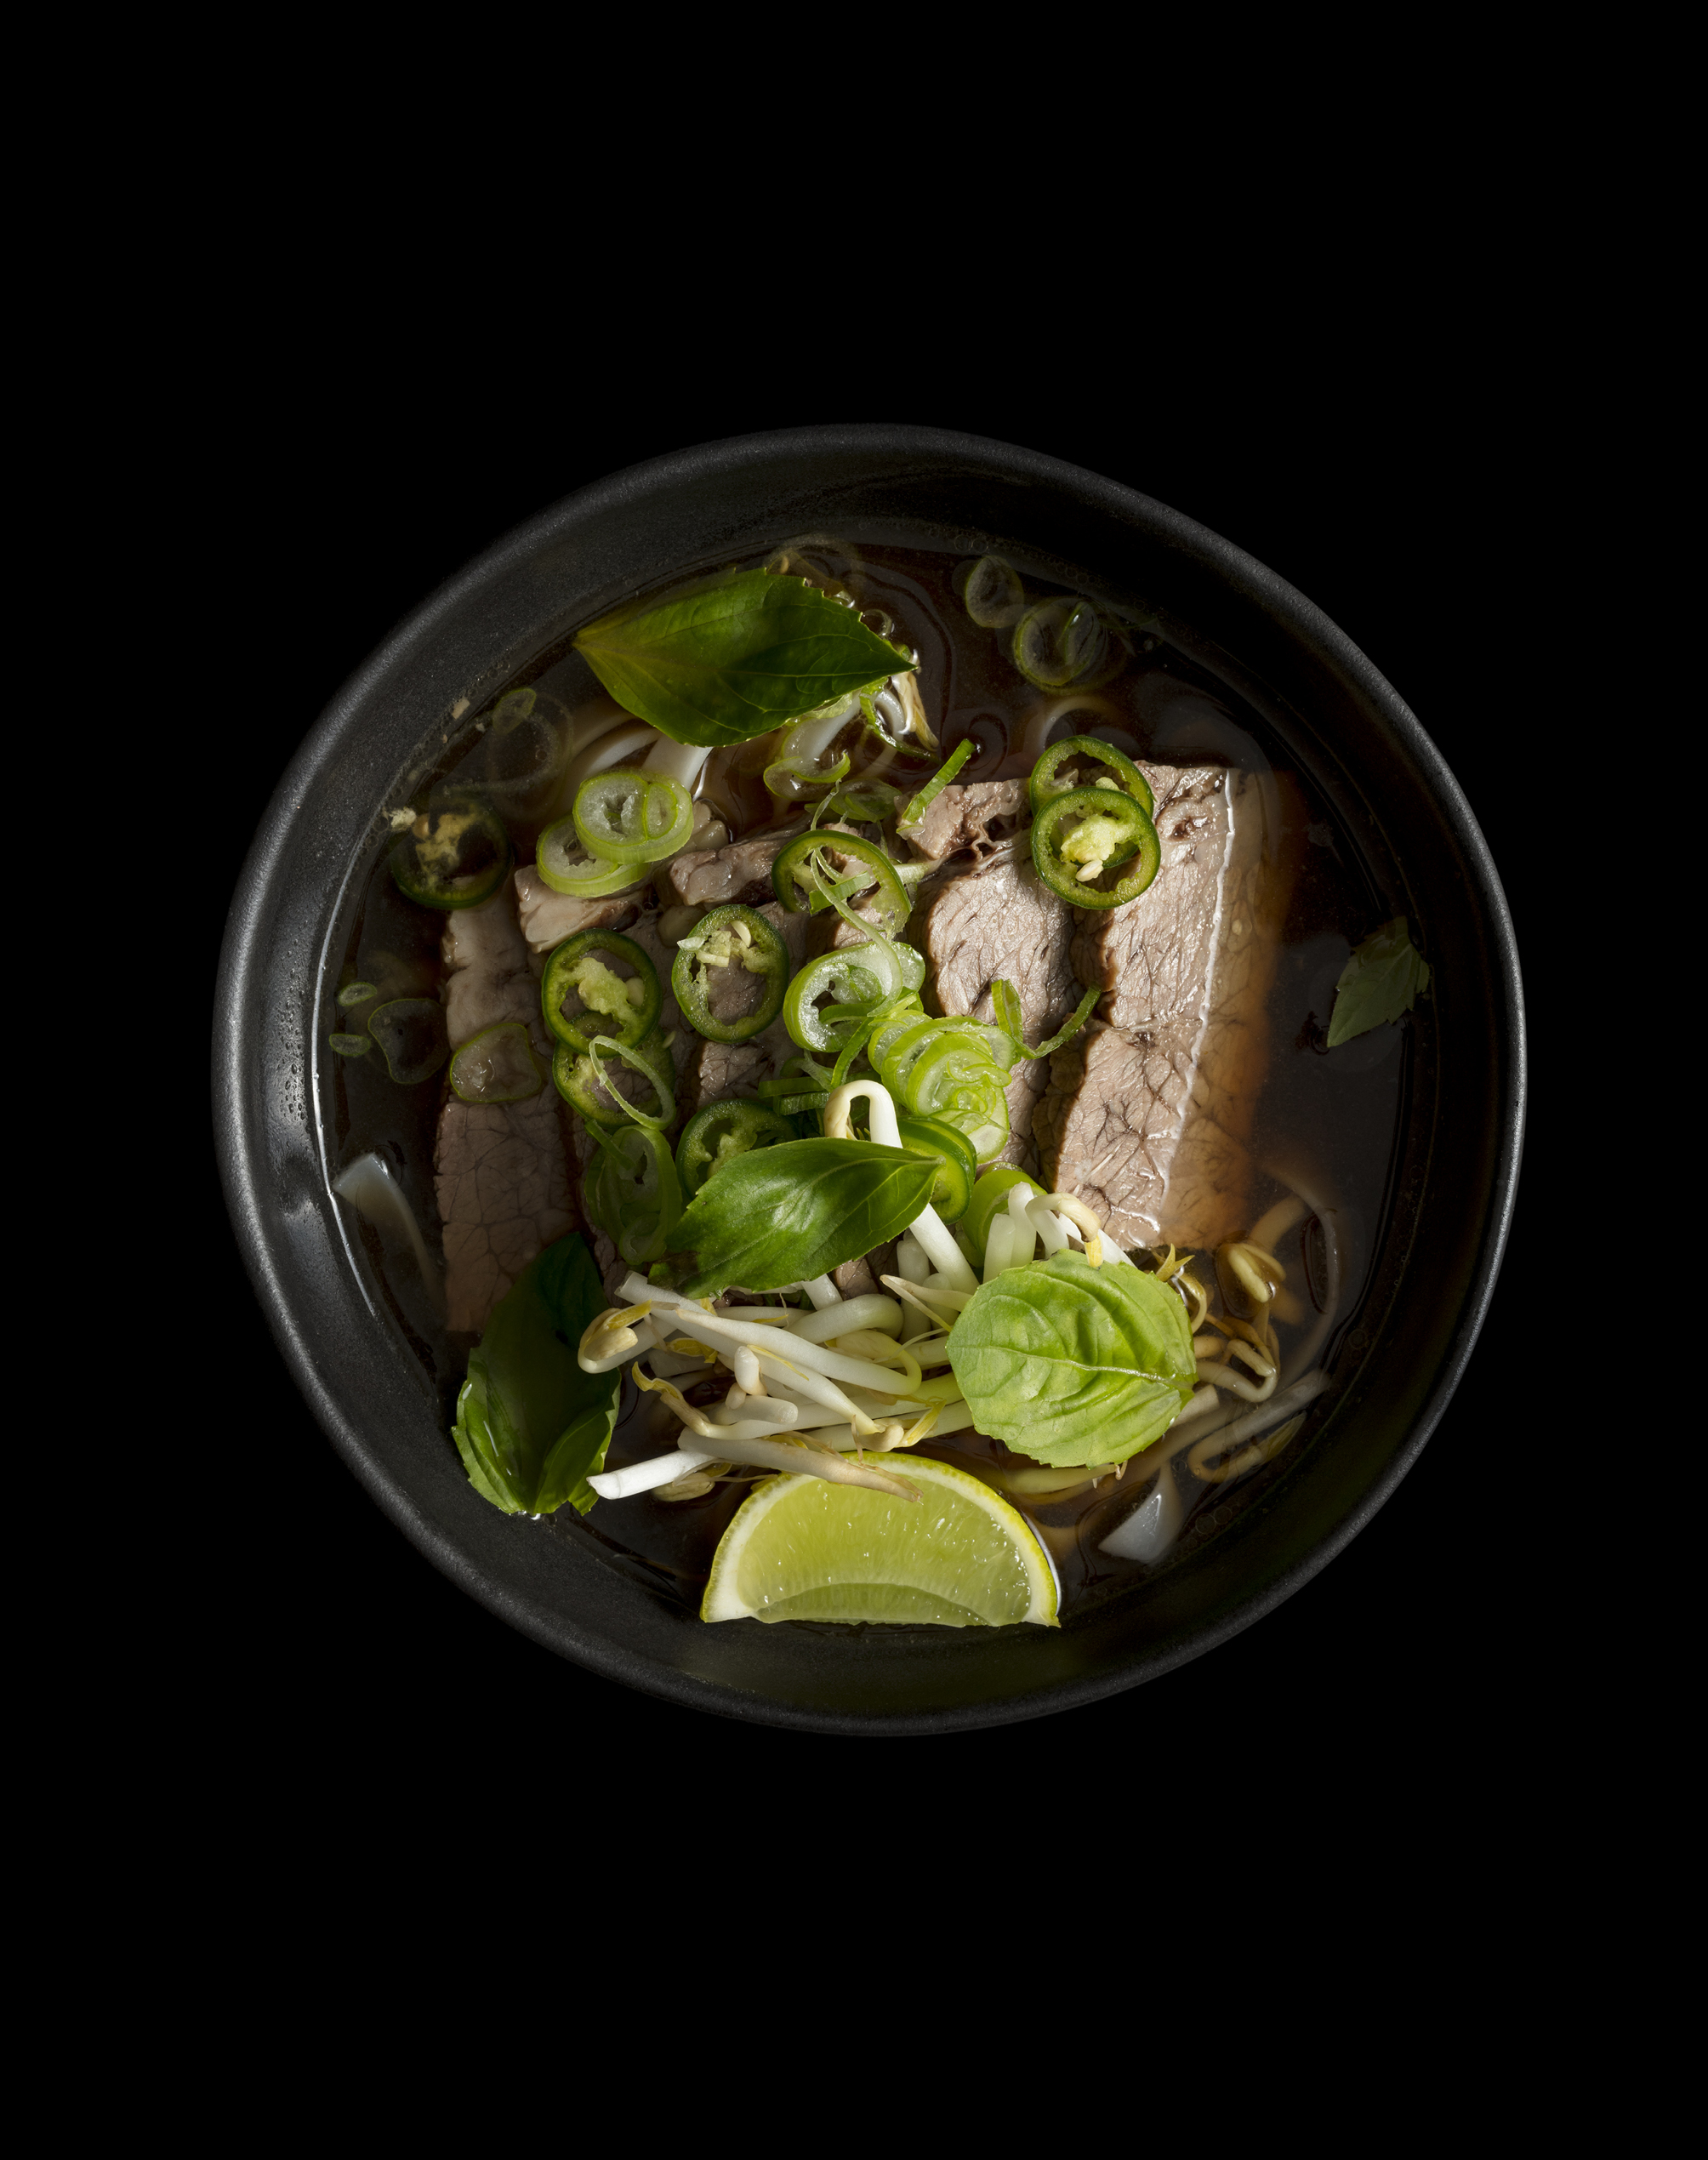 Beef Noodle Soup_Charles Phan_image copyright © Kieran E. Scott.jpg